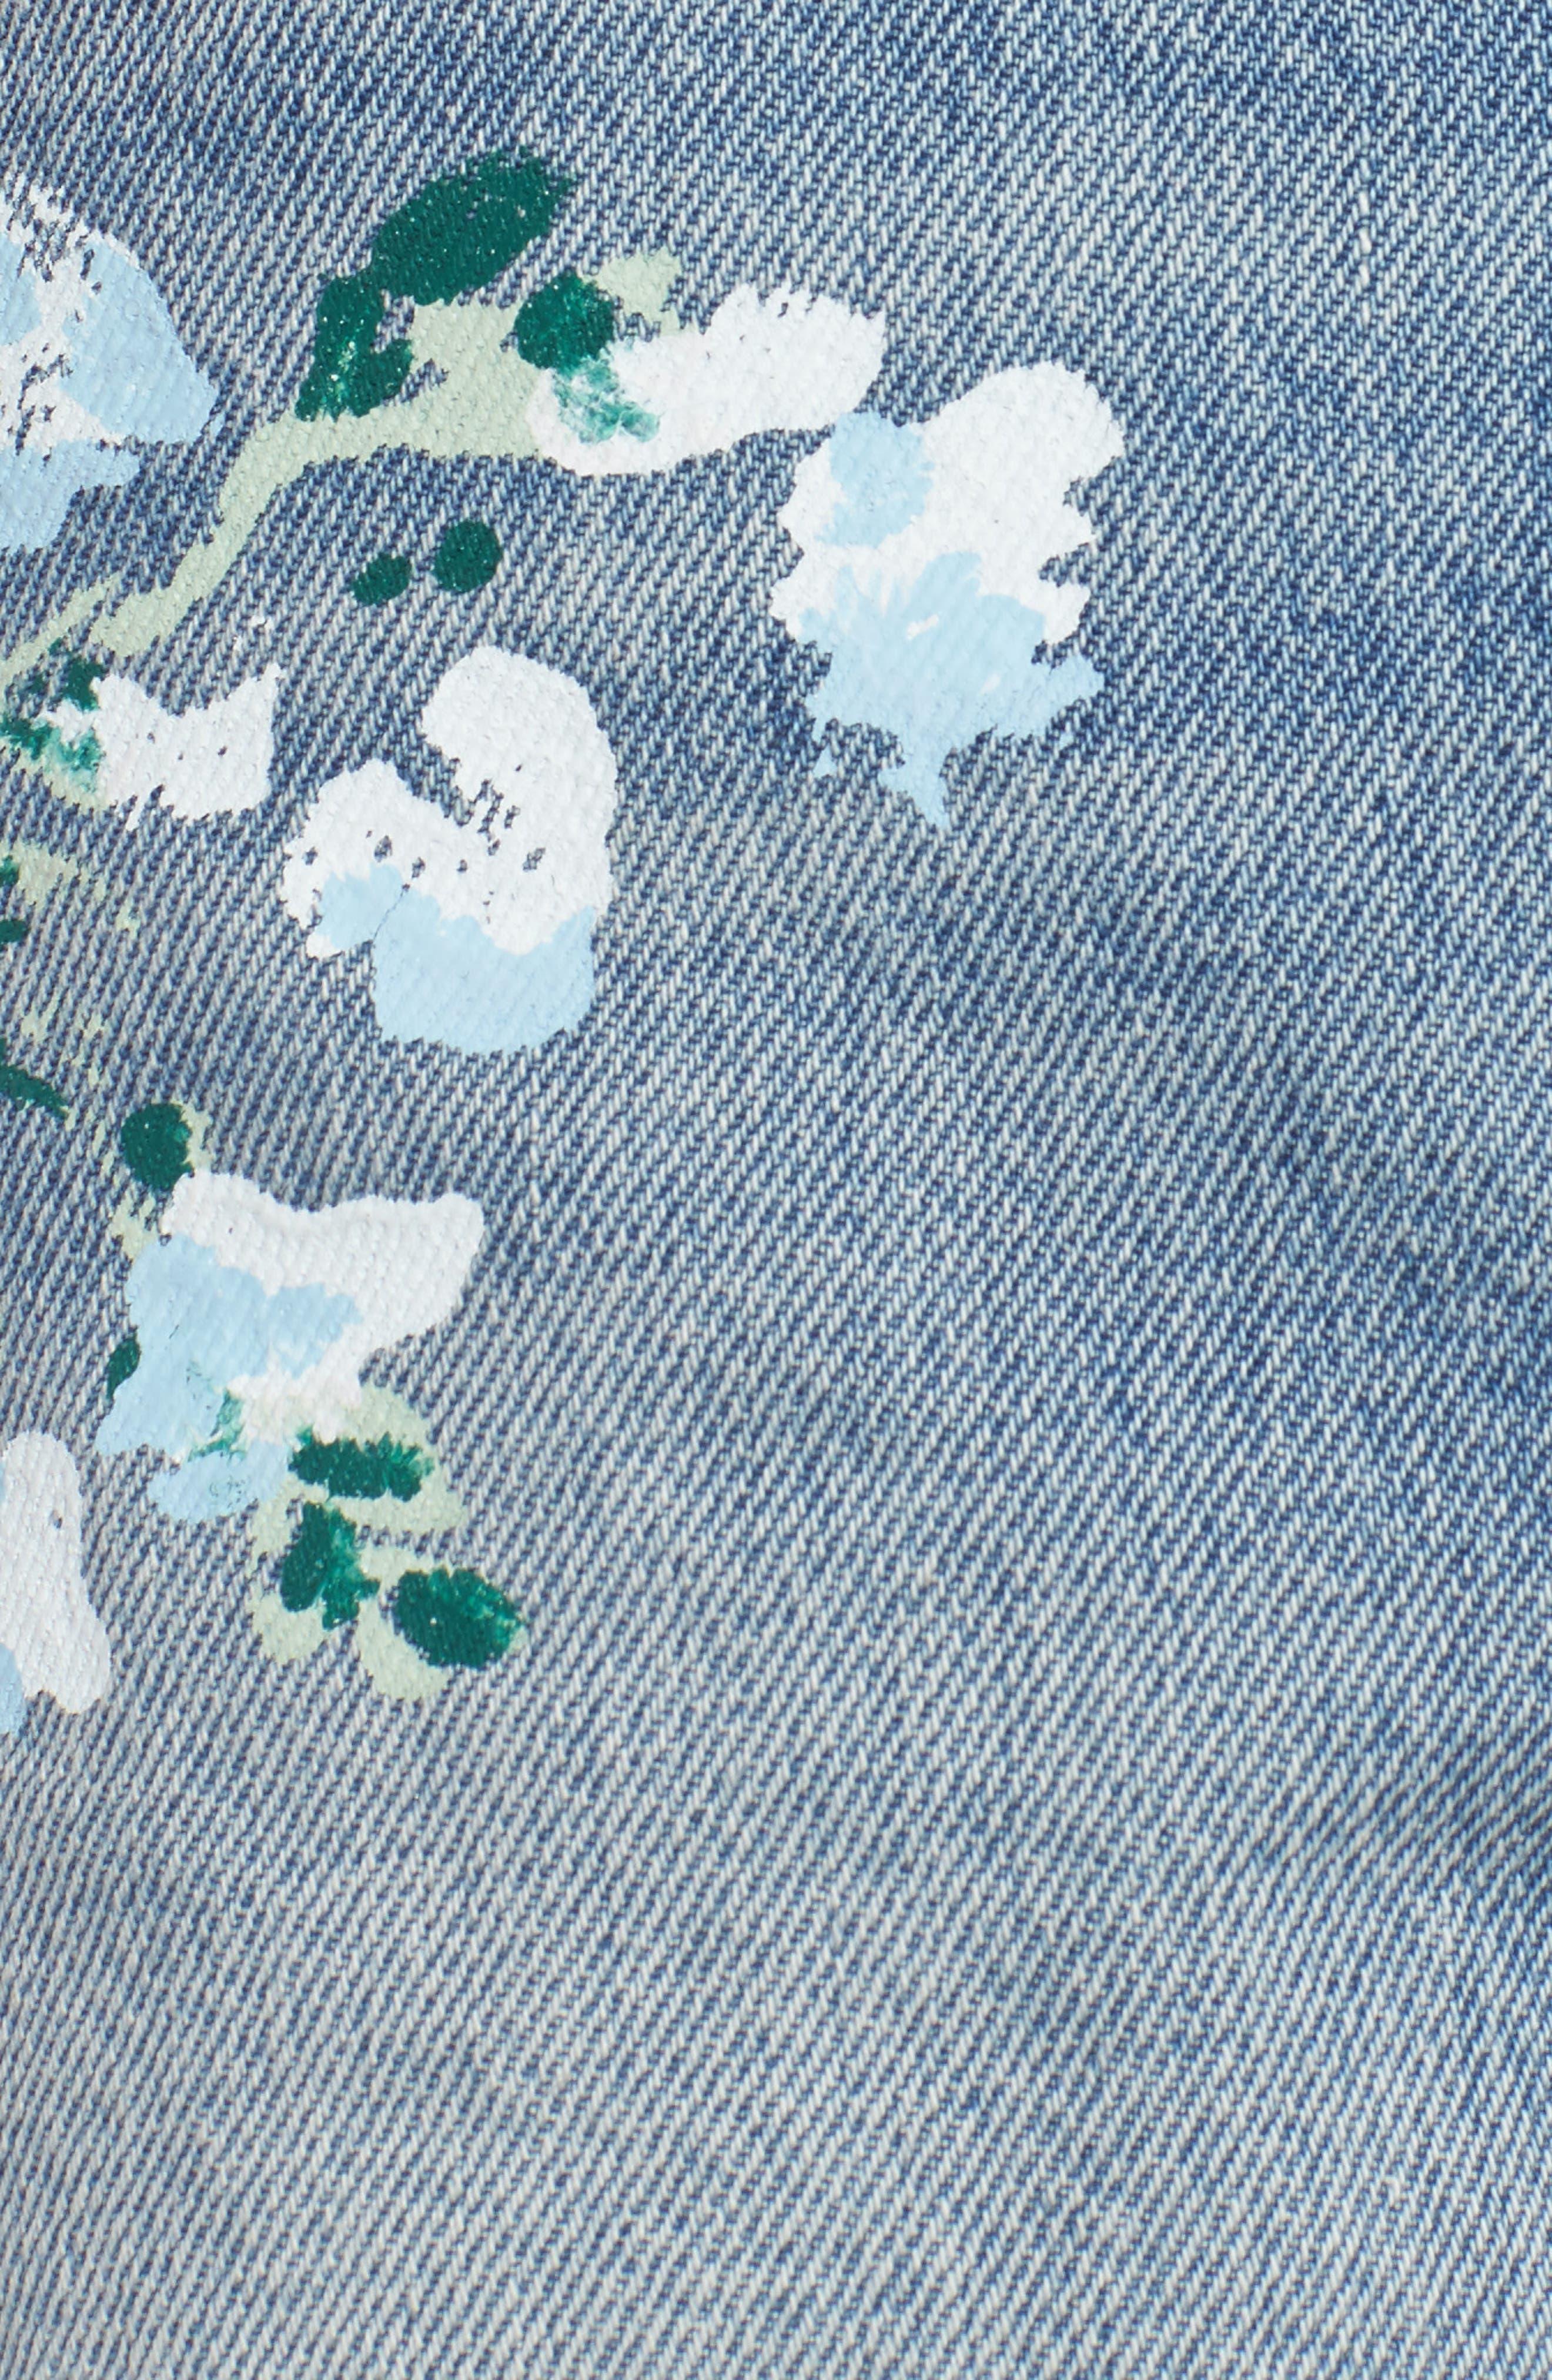 Handpainted Cutoff Denim Shorts,                             Alternate thumbnail 5, color,                             Vintage Wythe Painted Floral